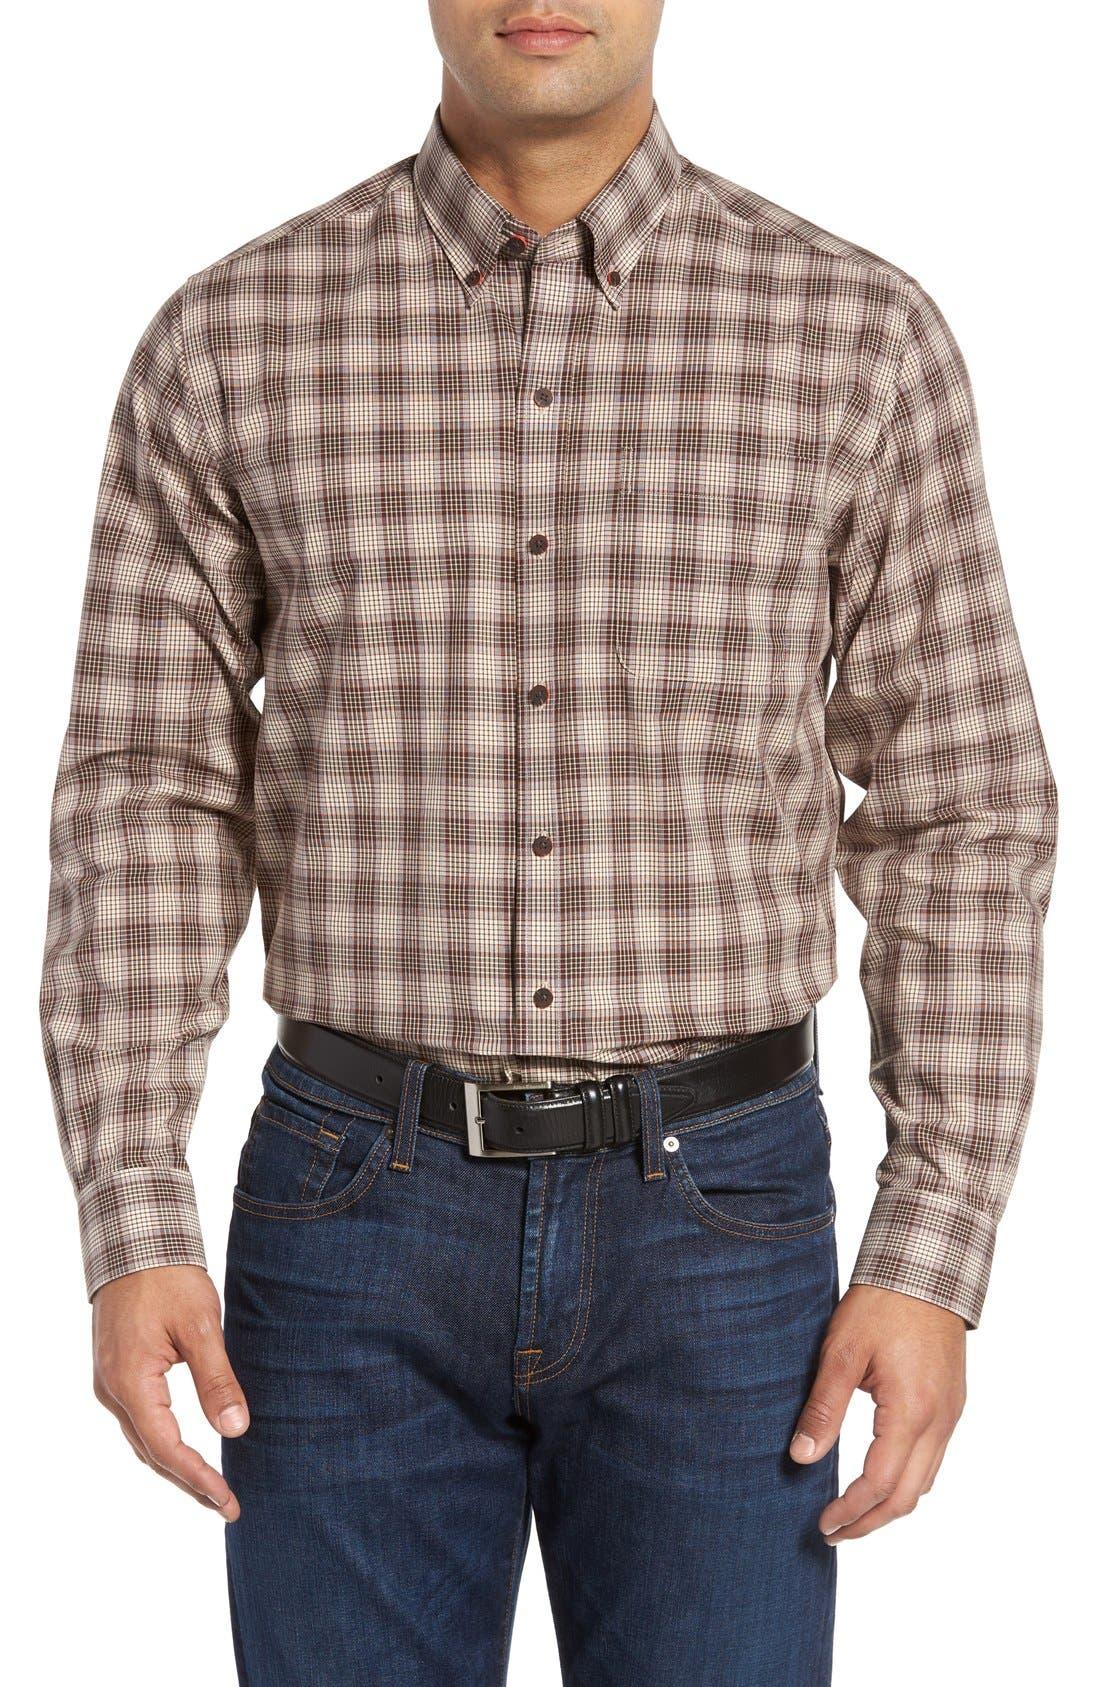 Alternate Image 1 Selected - Cutter & Buck 'Ridge' Plaid Cotton Poplin Sport Shirt (Big & Tall)